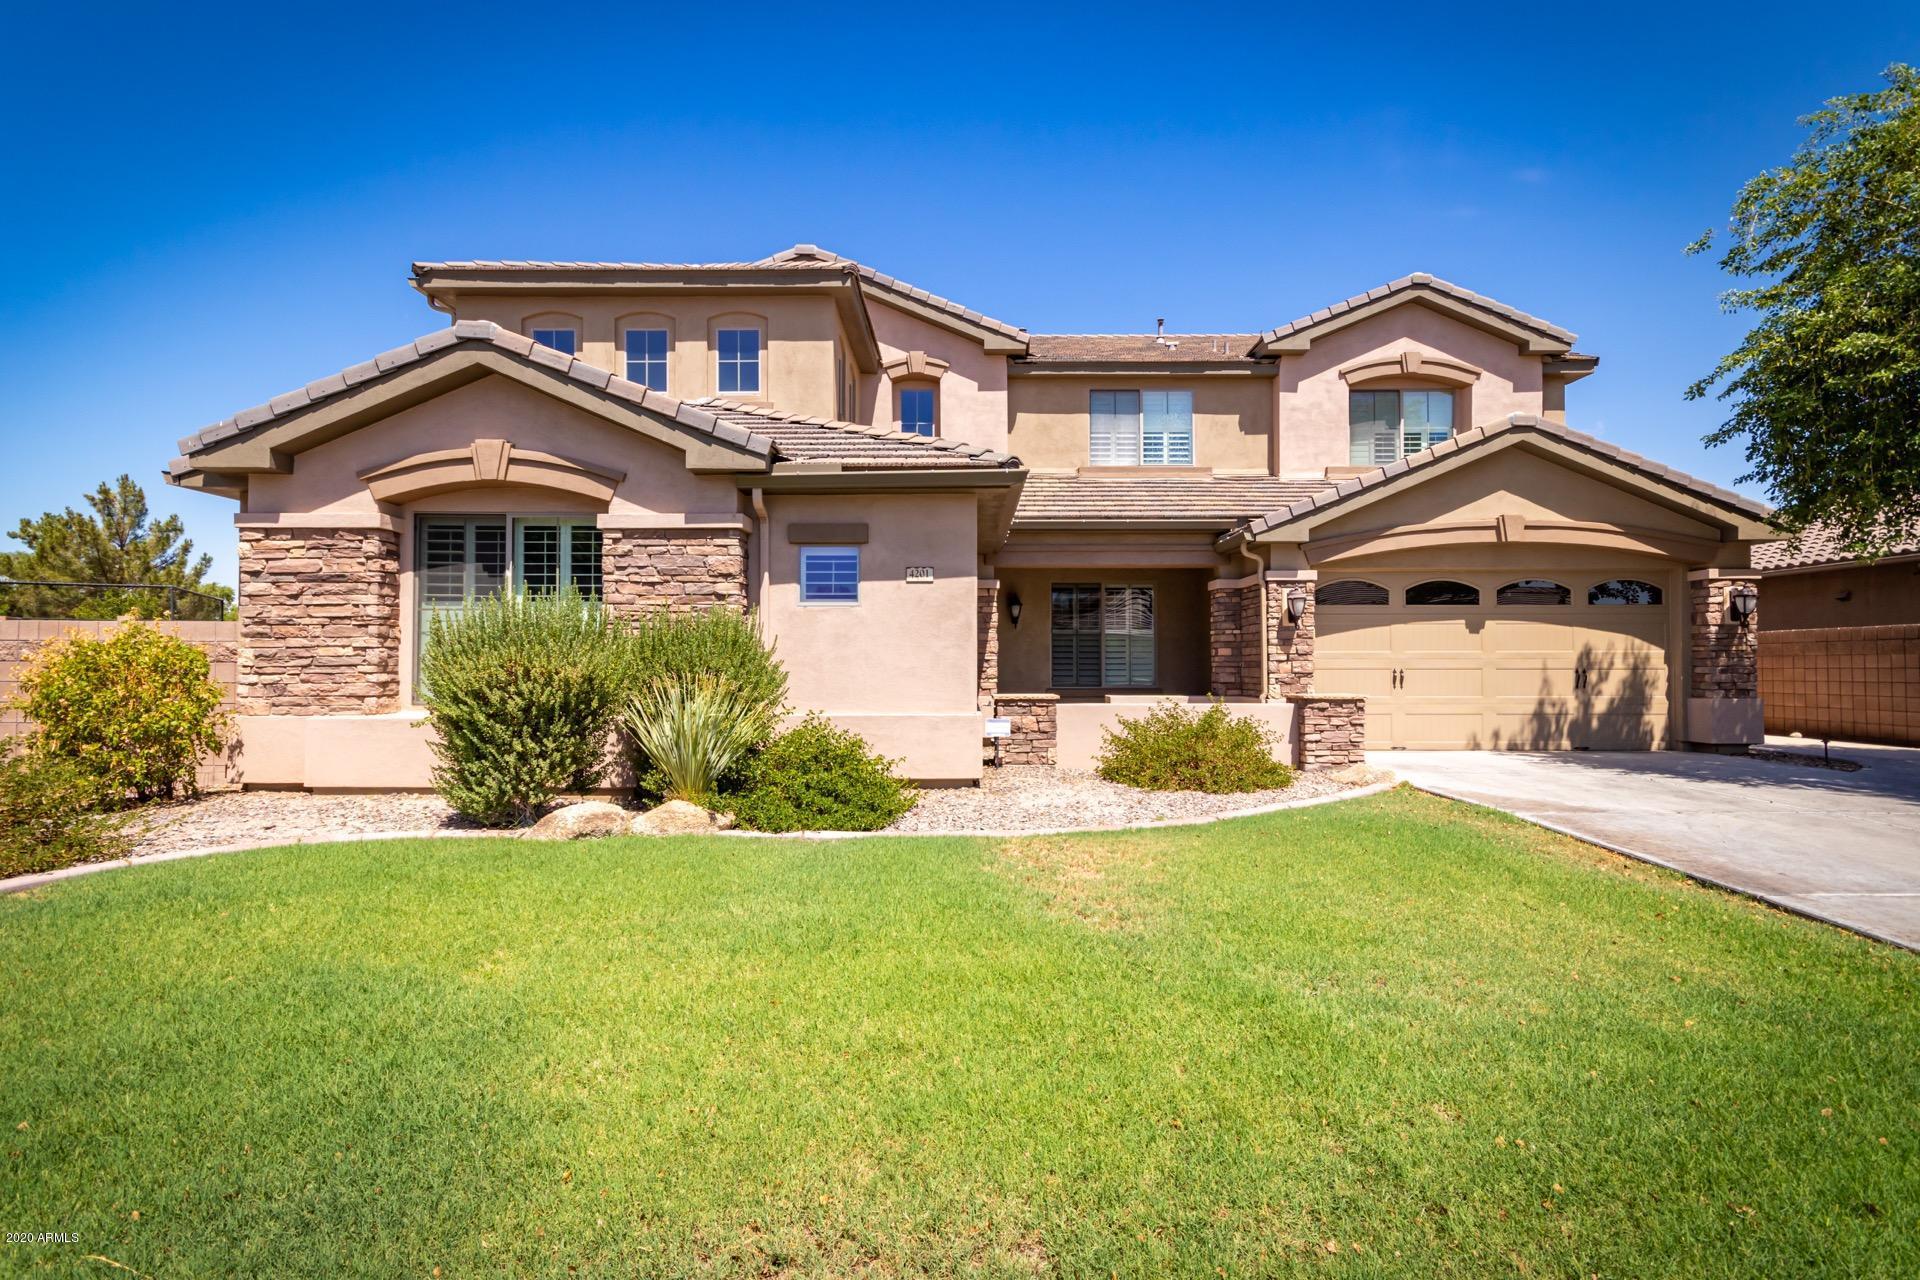 MLS 6105393 Chandler Metro Area, Chandler, AZ 85249 Chandler Homes for Rent